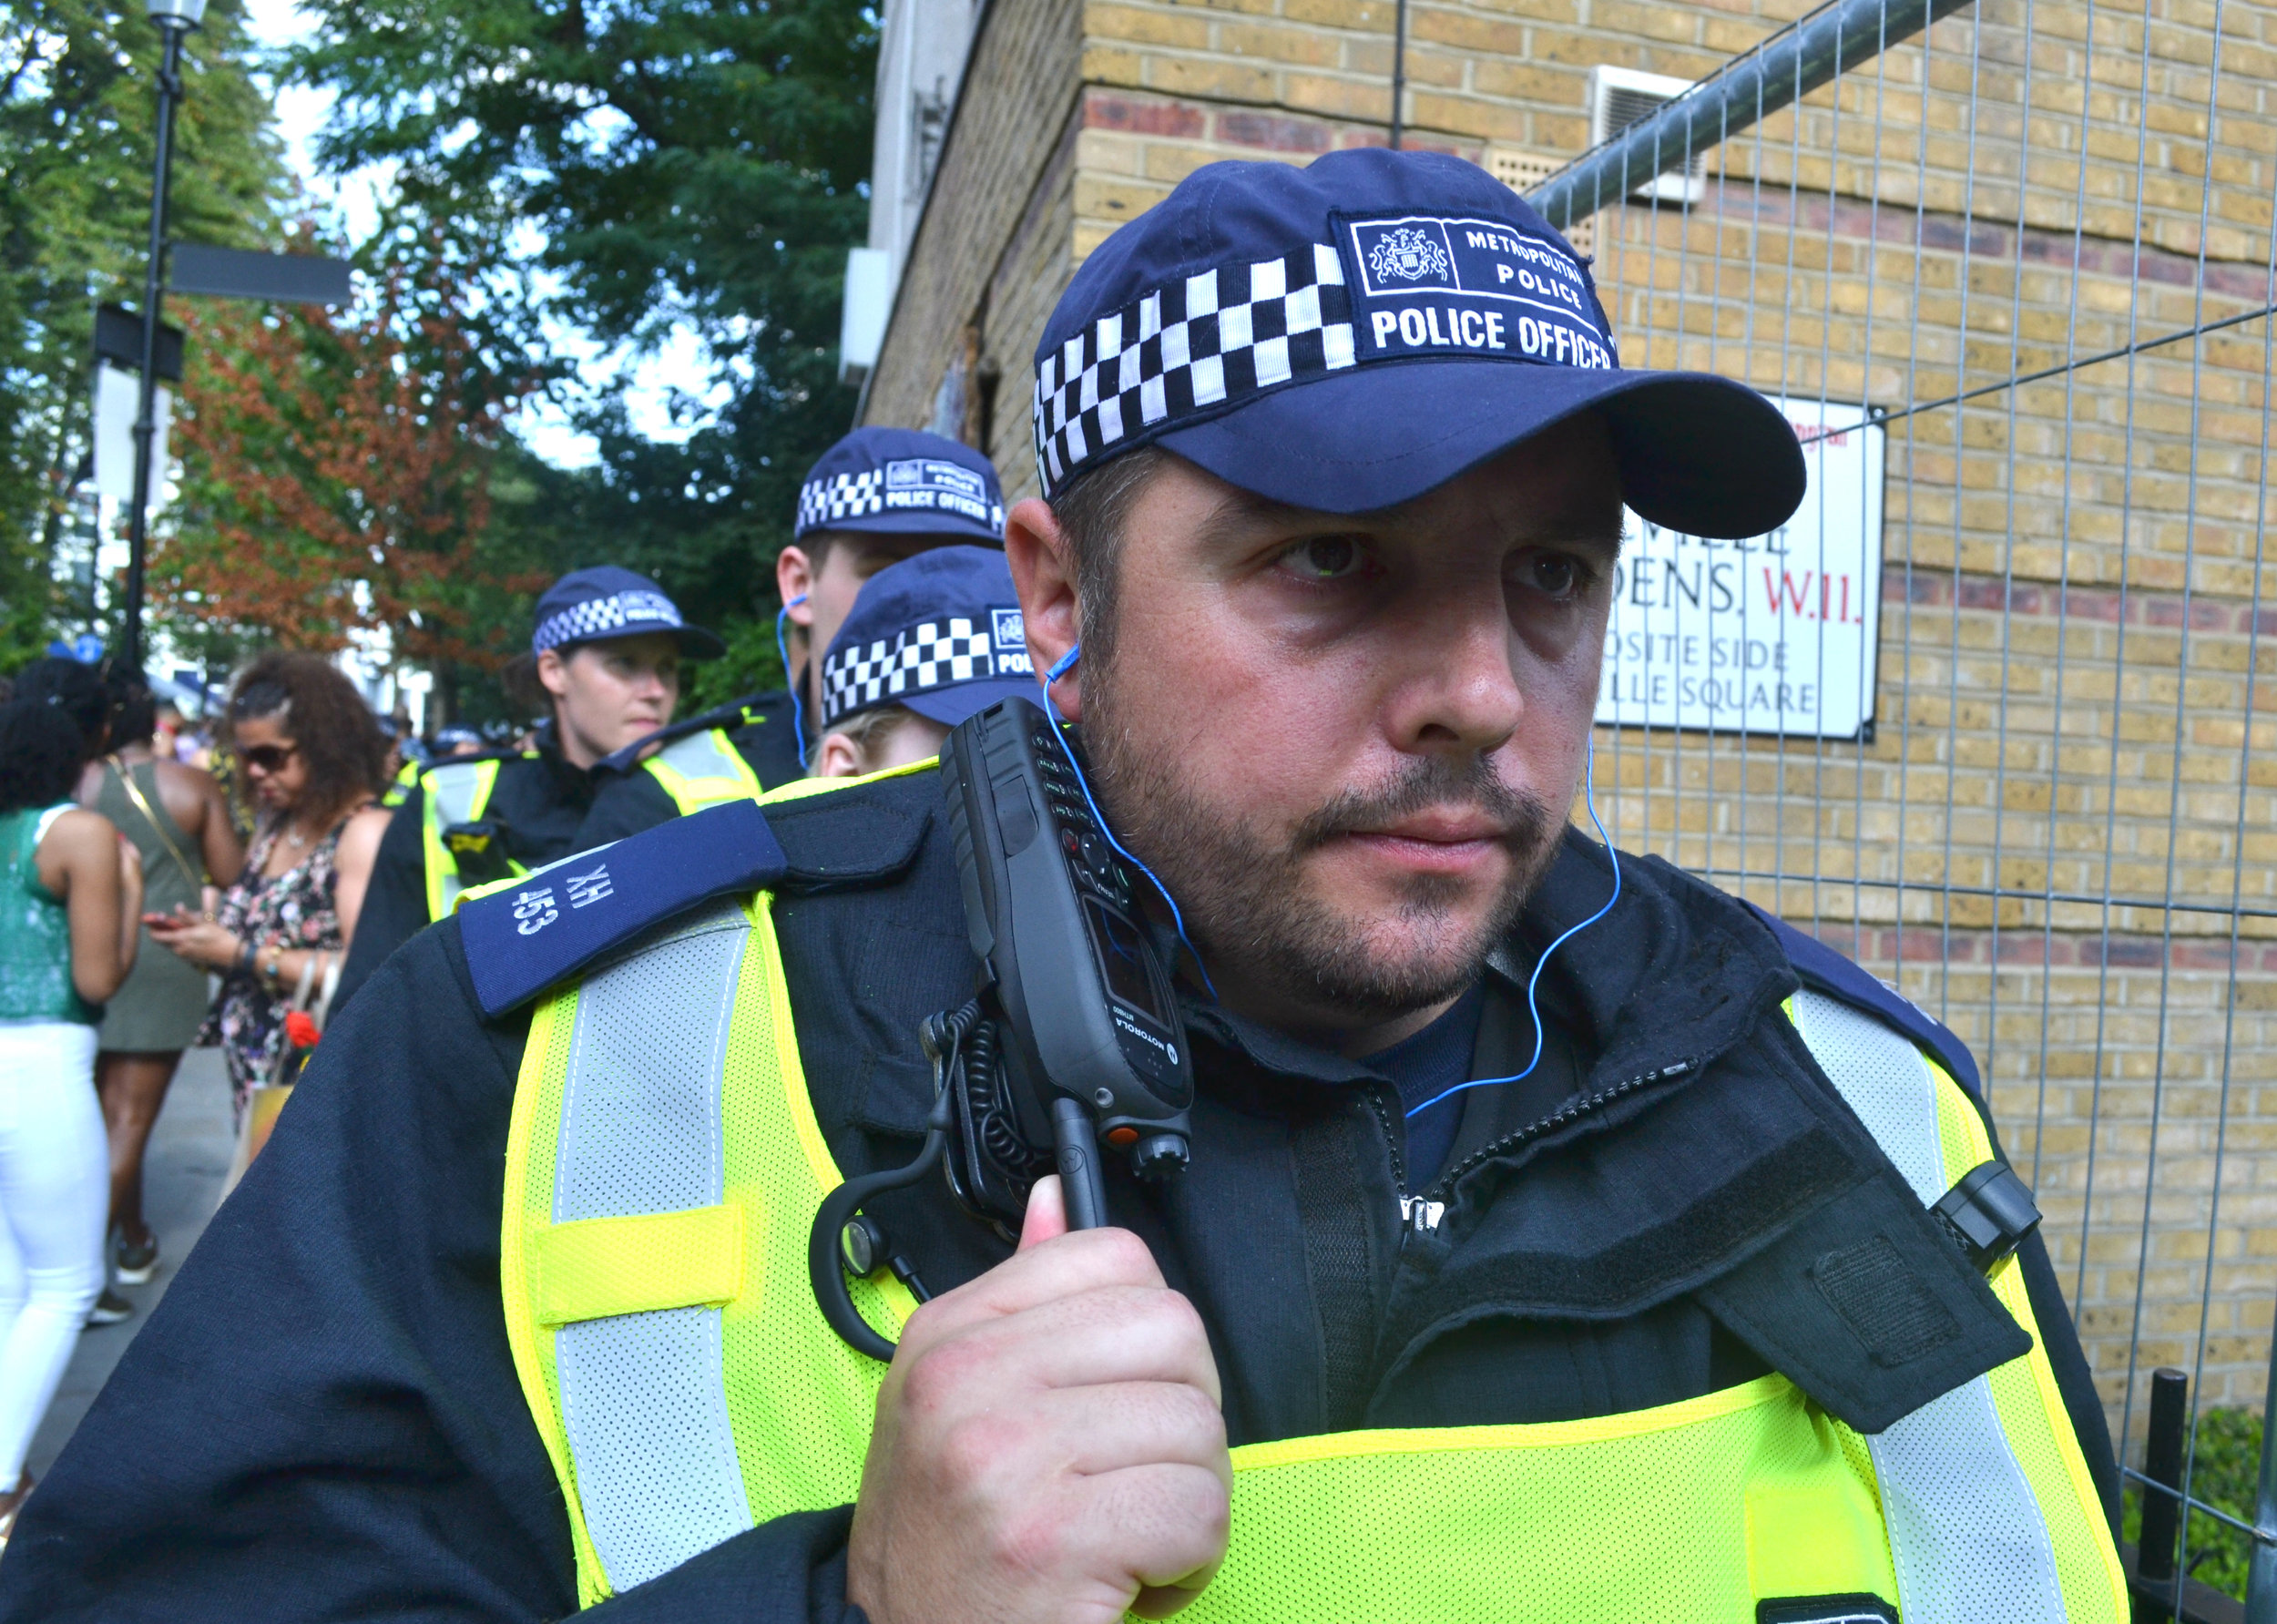 Police final.jpg